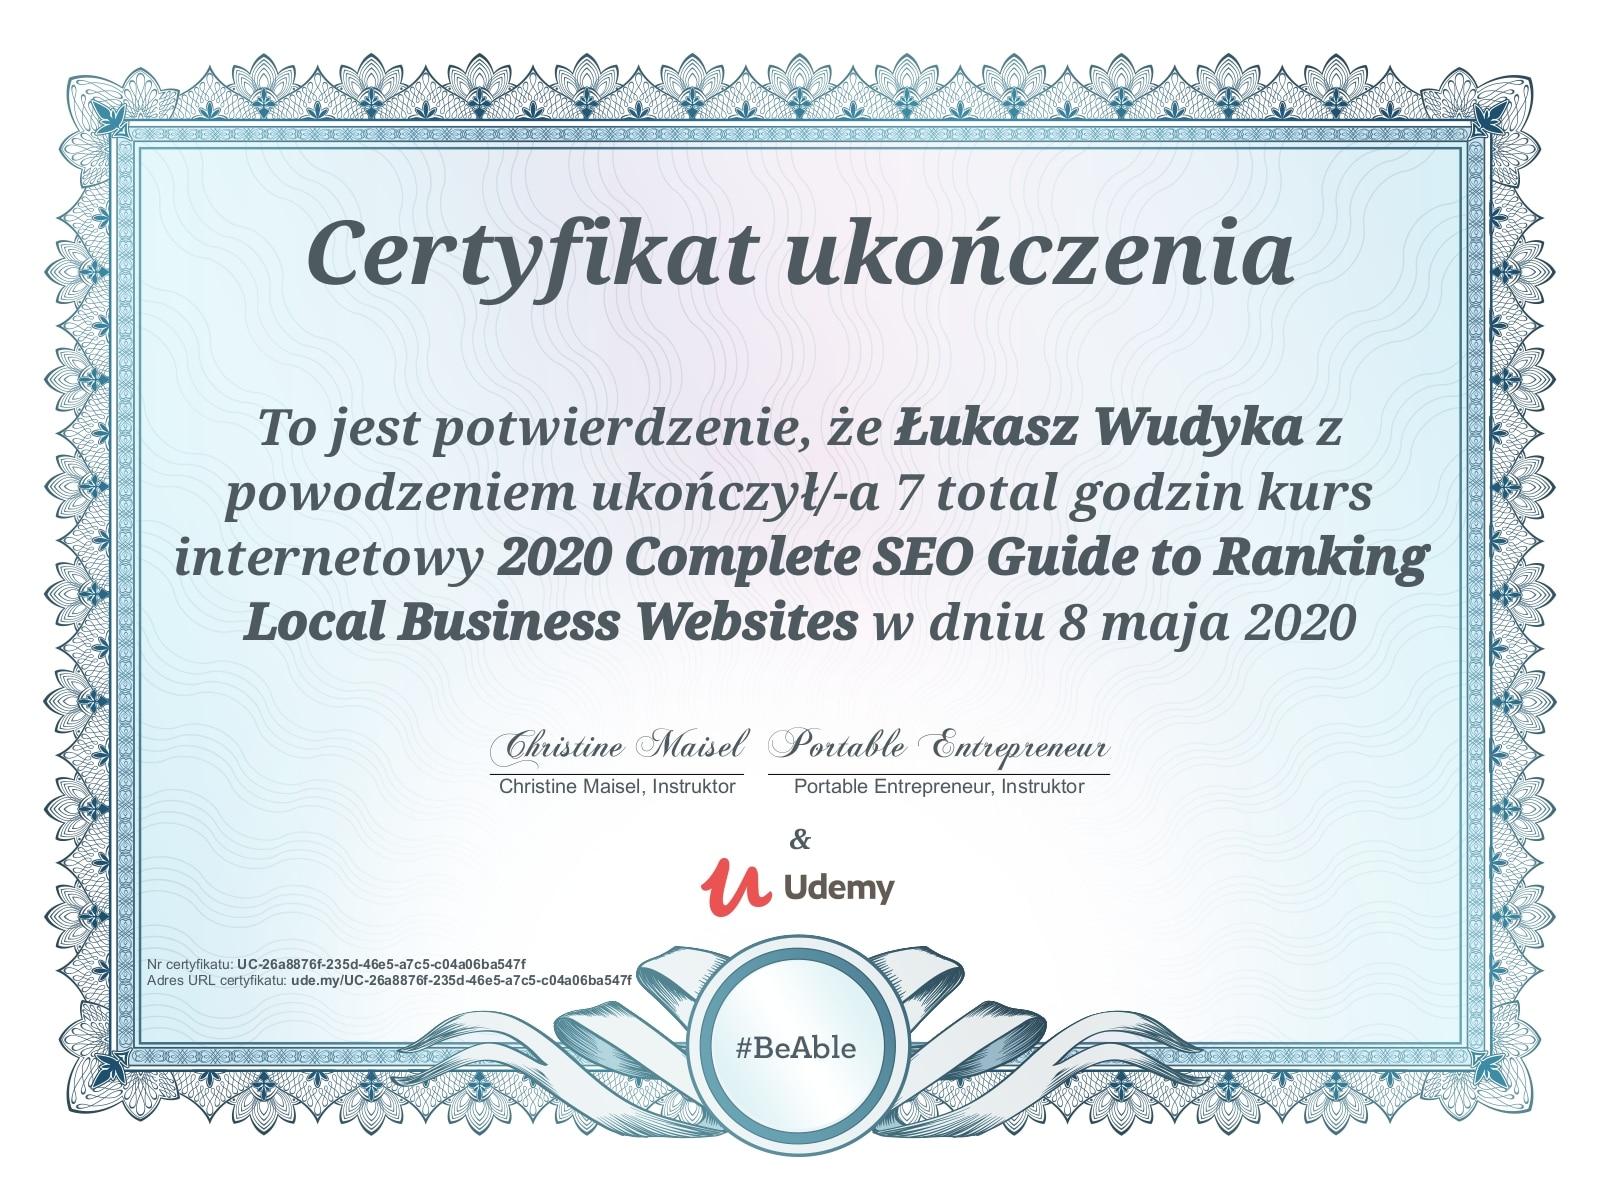 Łukasz Wudyka certyfikat UDEMY - 2020 Complete SEO Guide to Ranking Local Buisness Websites